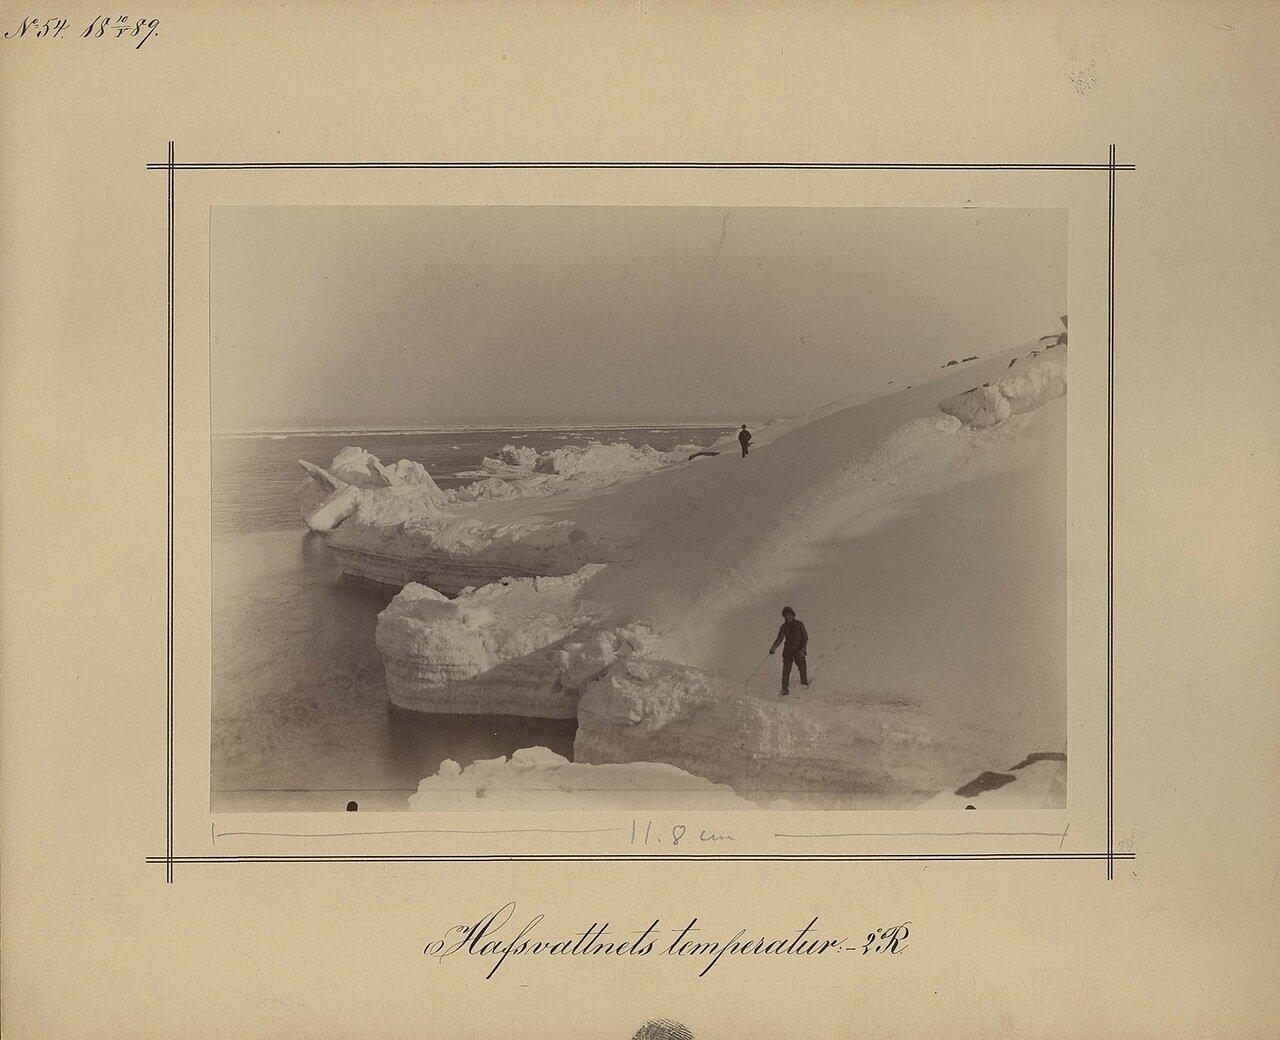 10.5.1889. Температура моря 2,5 ° c